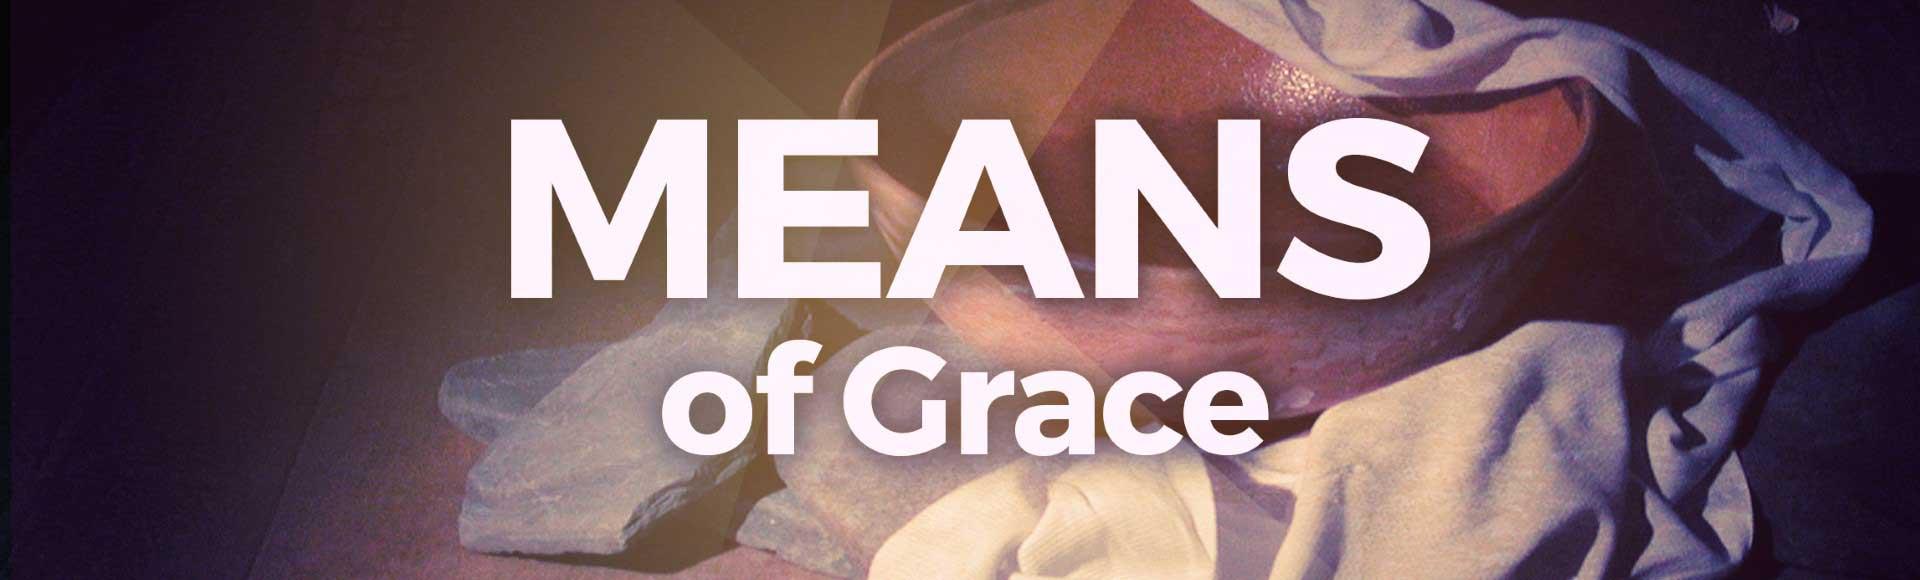 Means of Grace Glendale United Methodist Church Nashville TN